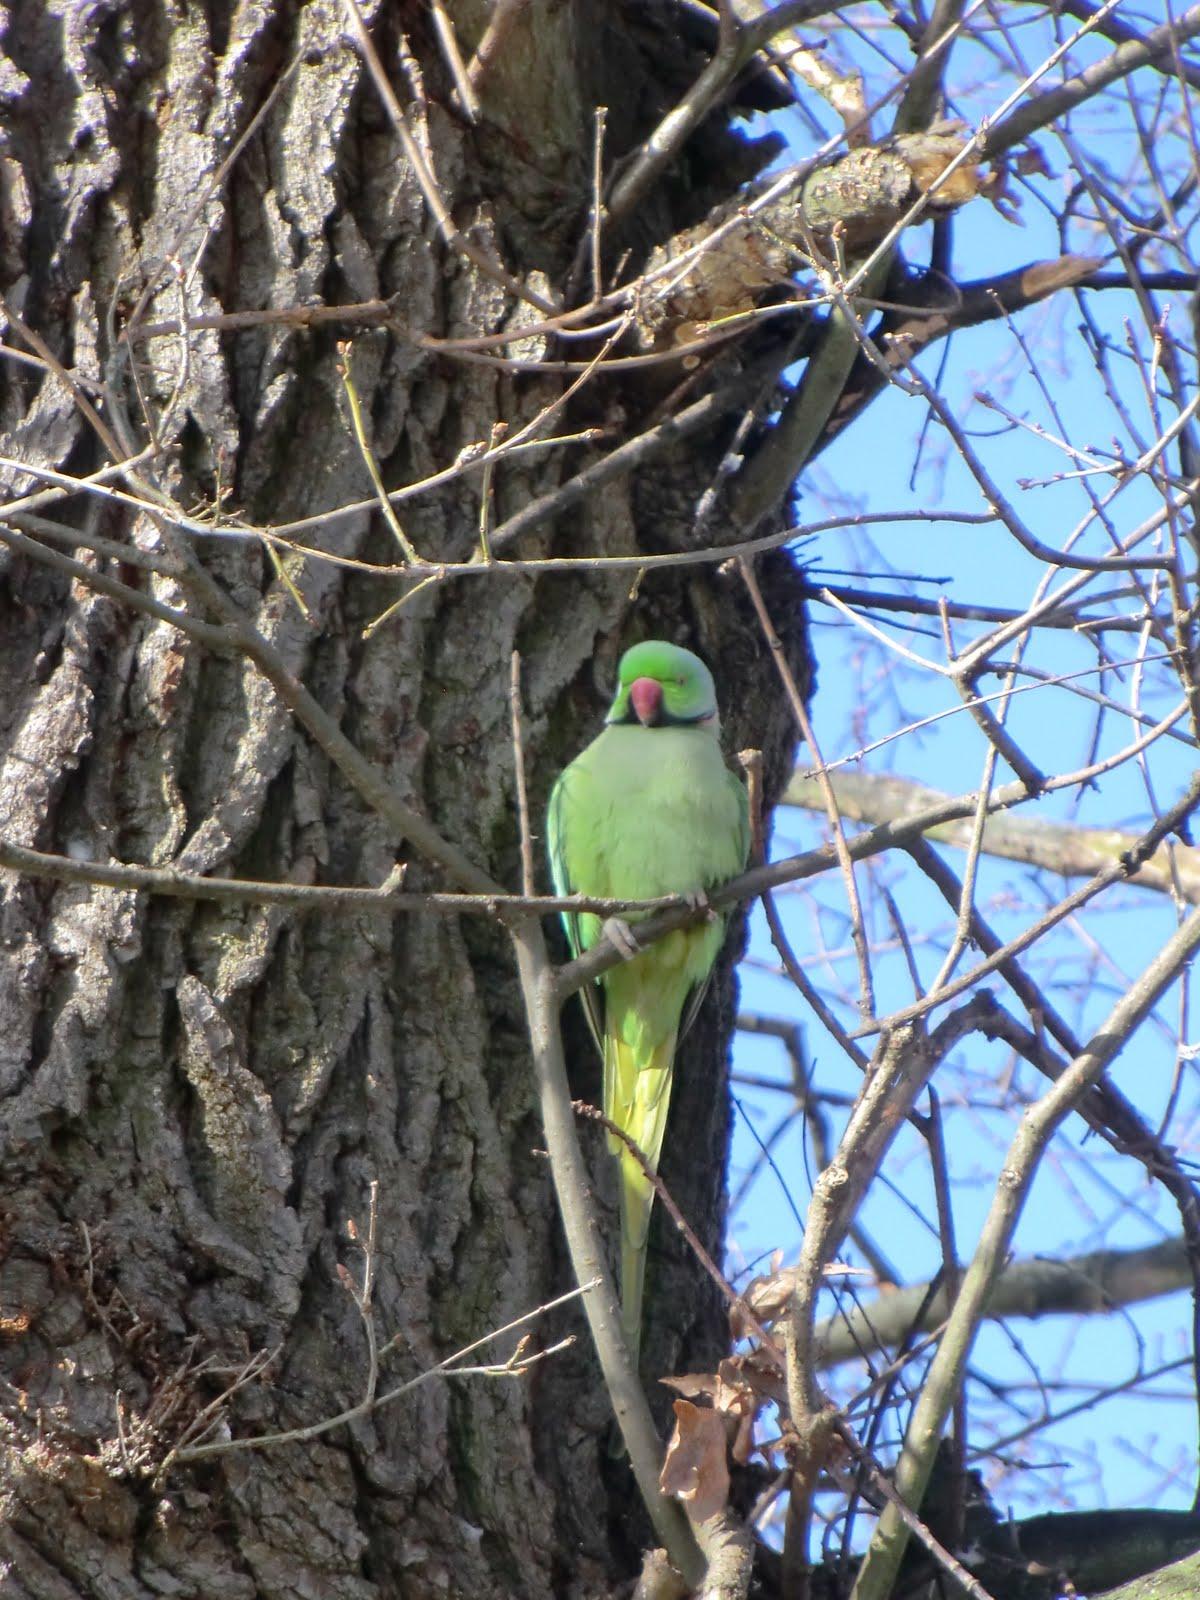 CIMG6724 A parakeet looks on